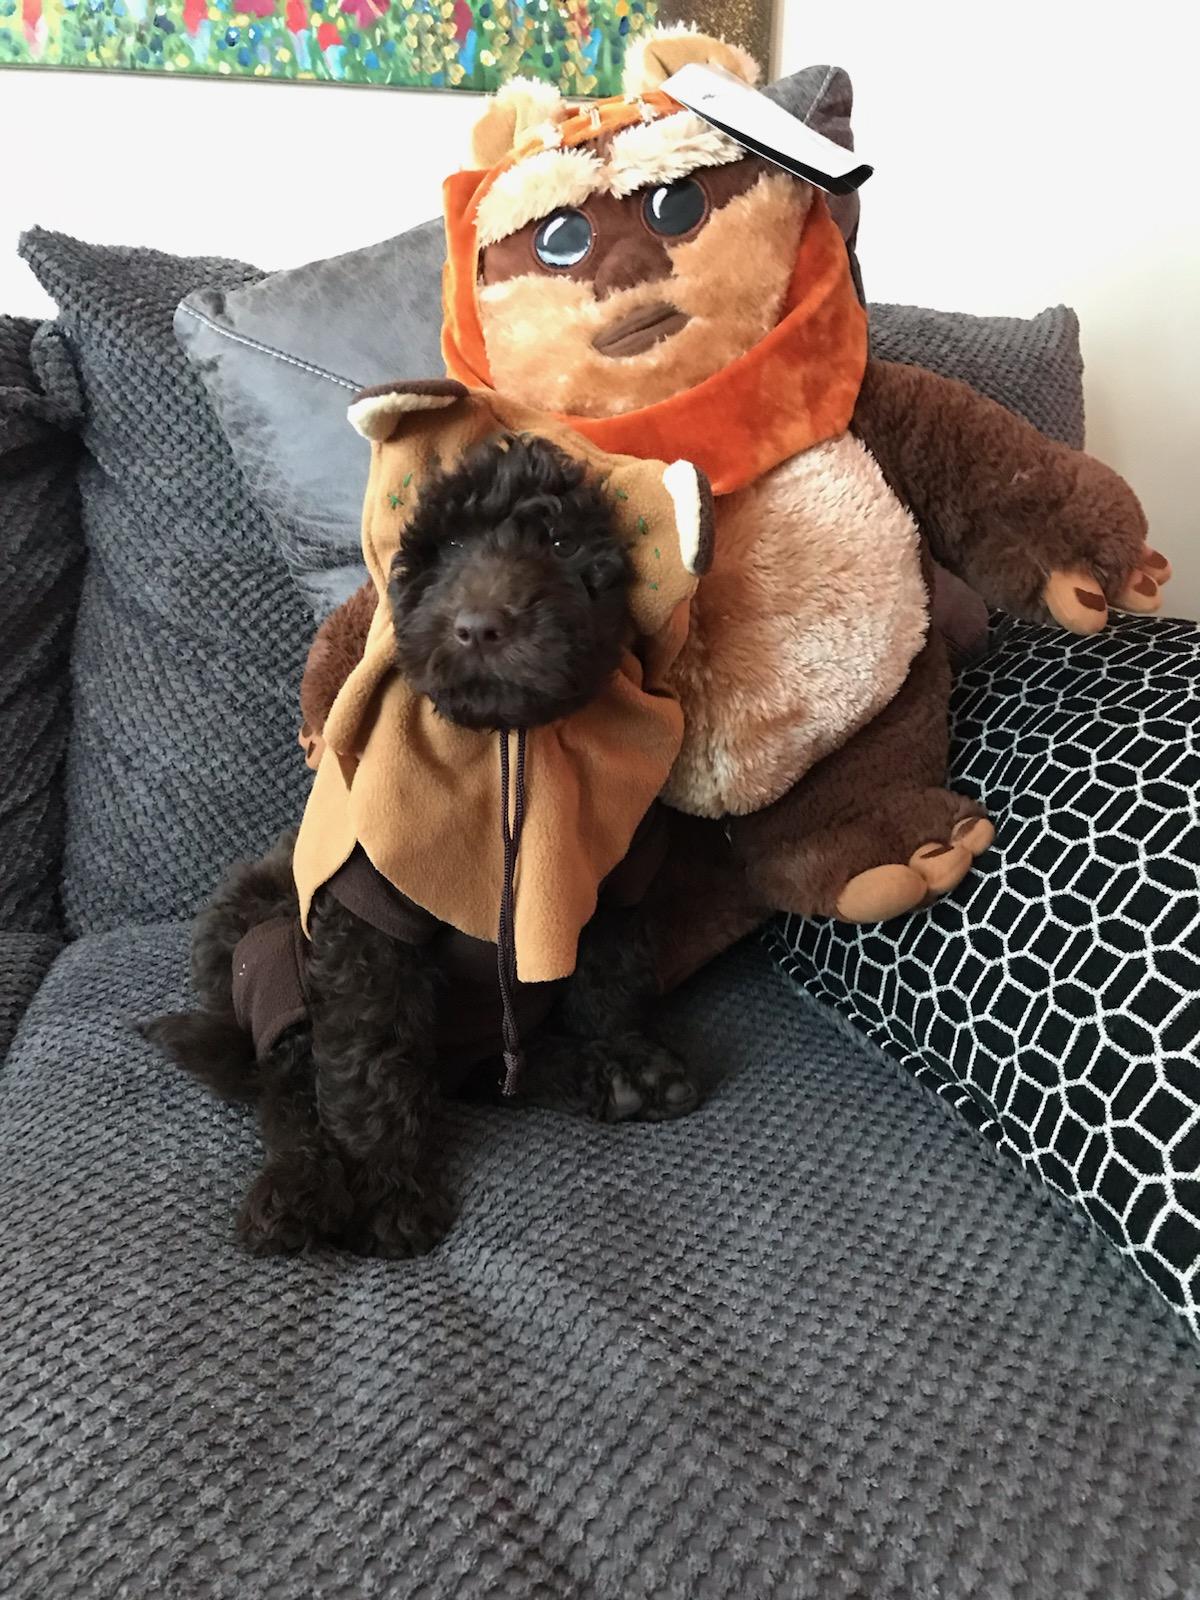 Return of the Ewoks